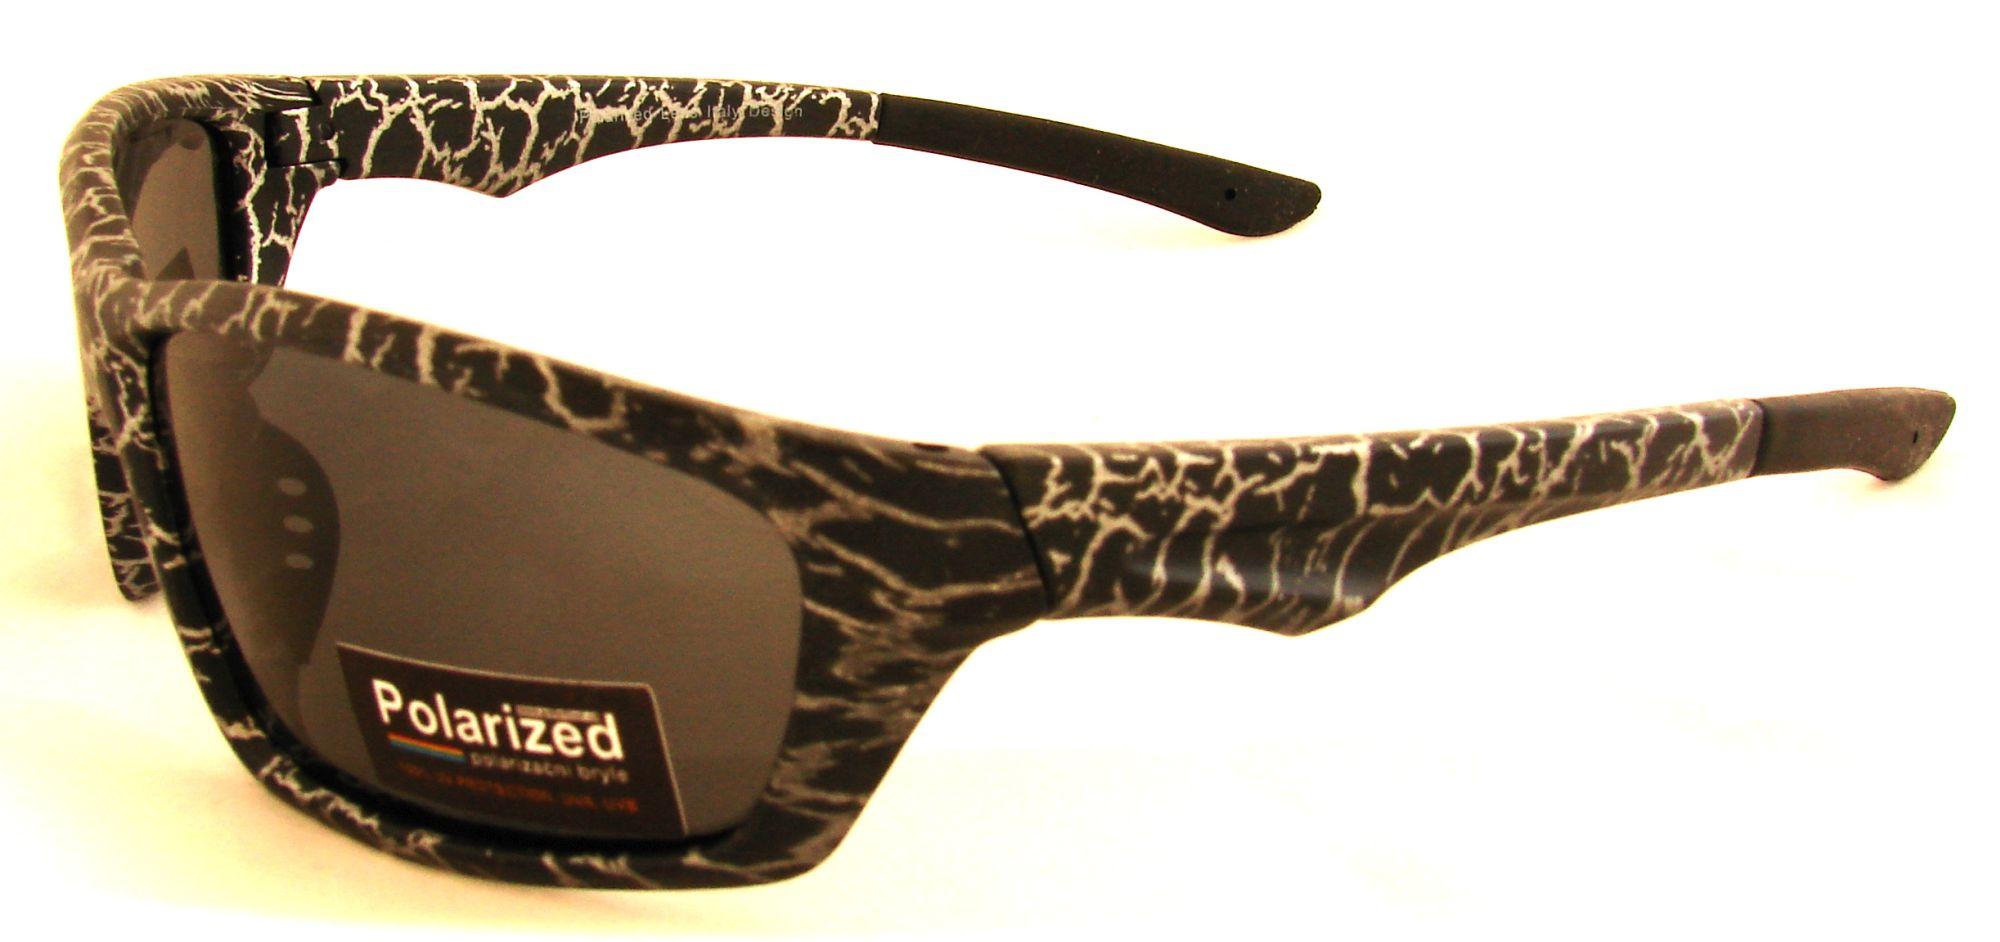 Polarized Brýle polarizační plastové tygrované SGLPO2.46